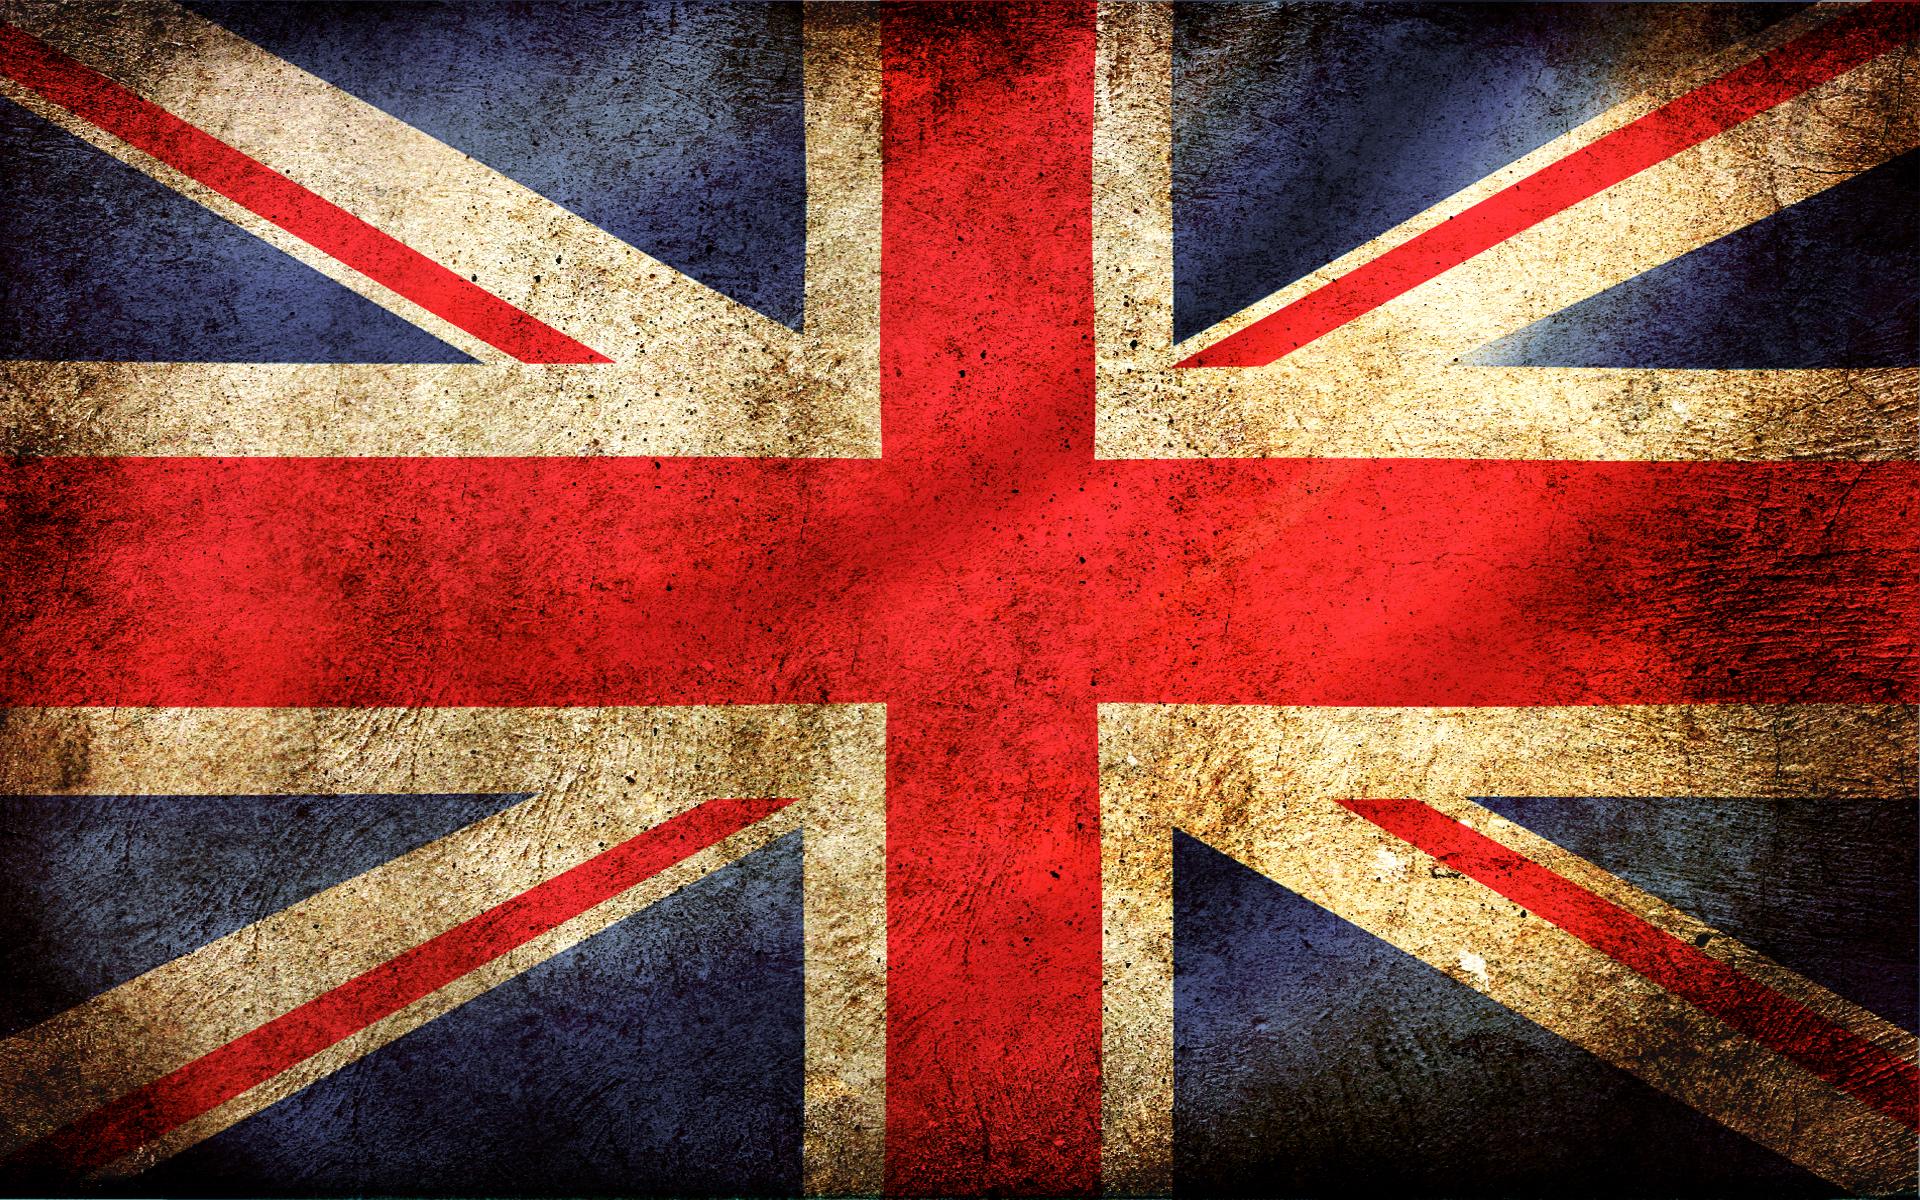 Hd wallpaper england - Hd Wallpaper England 30